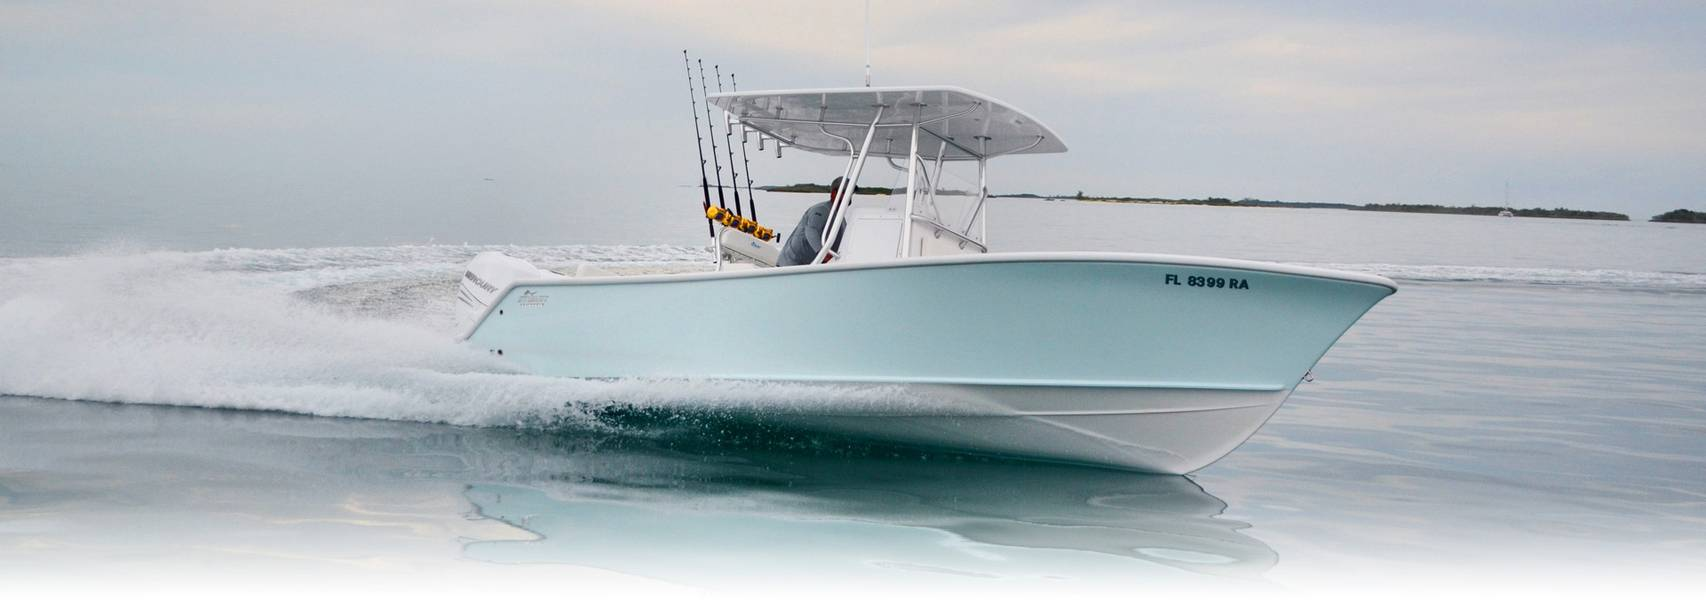 Stuart Boatworks 27は今年のマイアミ国際ボートショーで最初に展示されたOcean5のゲームチェンジャーでした。 Image Courtesy Ocean 5海軍建築家。